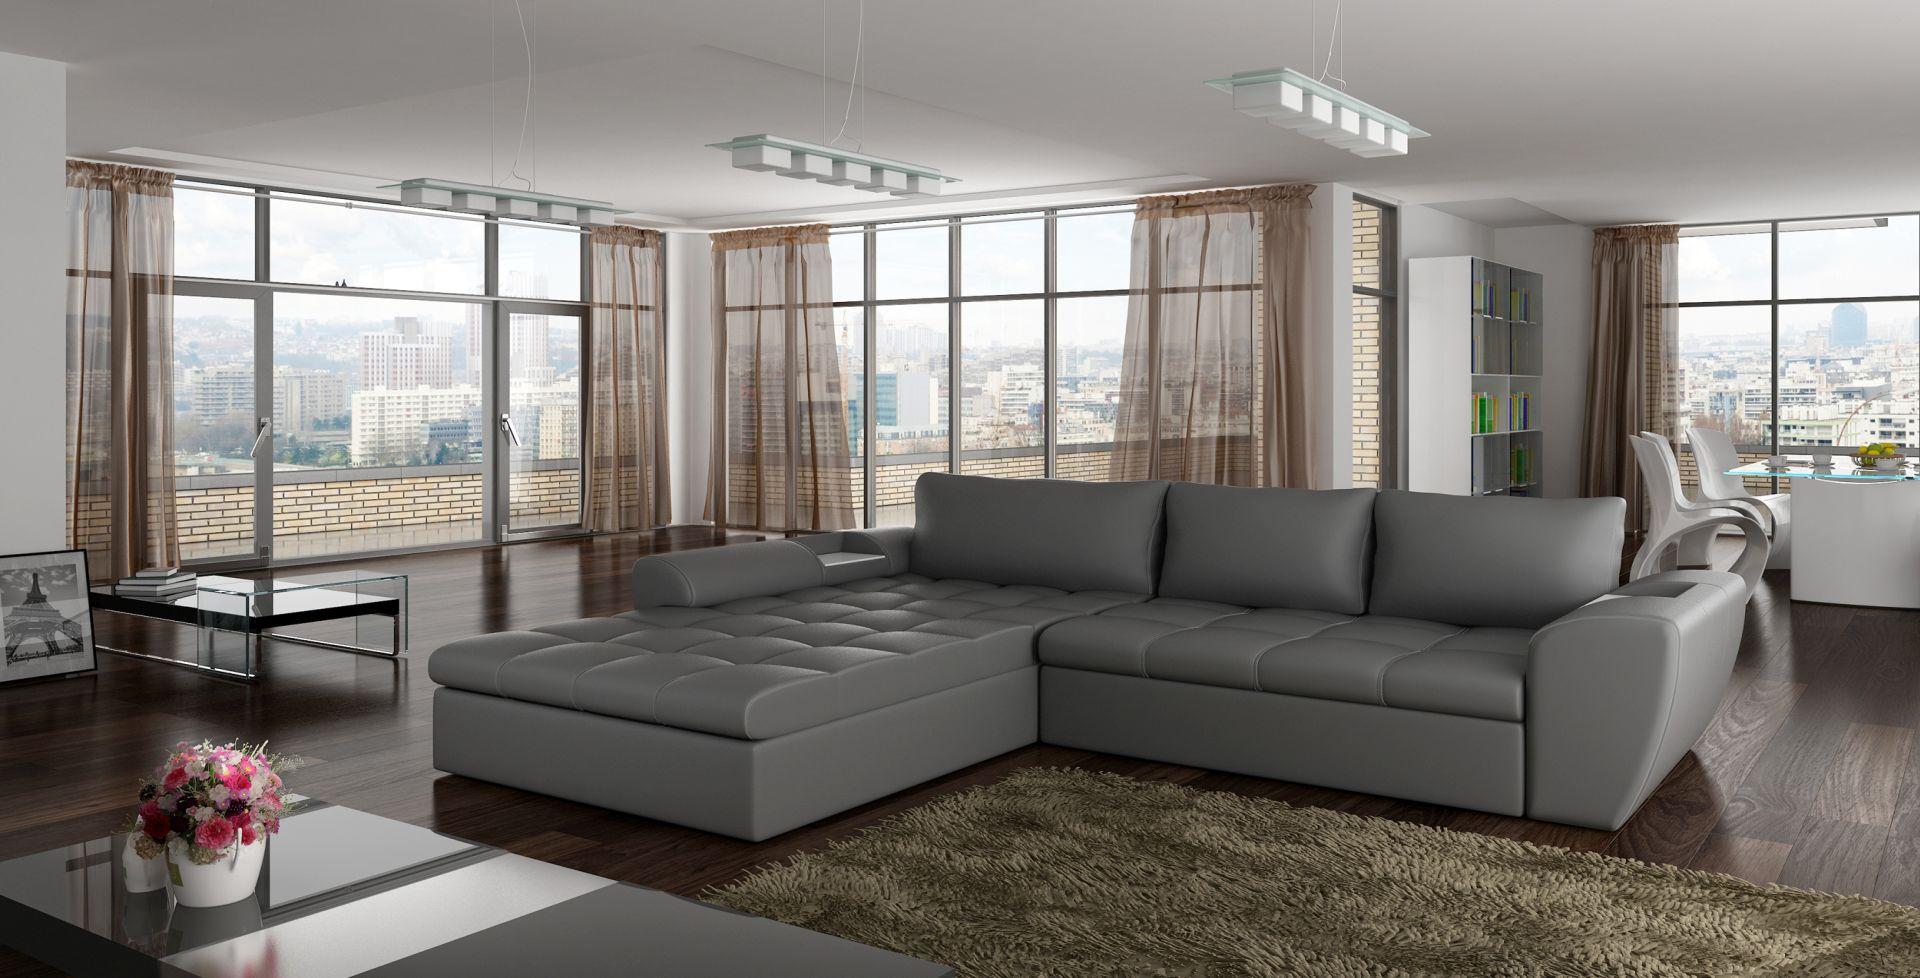 sofa schlafsofa designer sofa mit bettfunktion bettkasten ecksofa couch neu la costa www. Black Bedroom Furniture Sets. Home Design Ideas